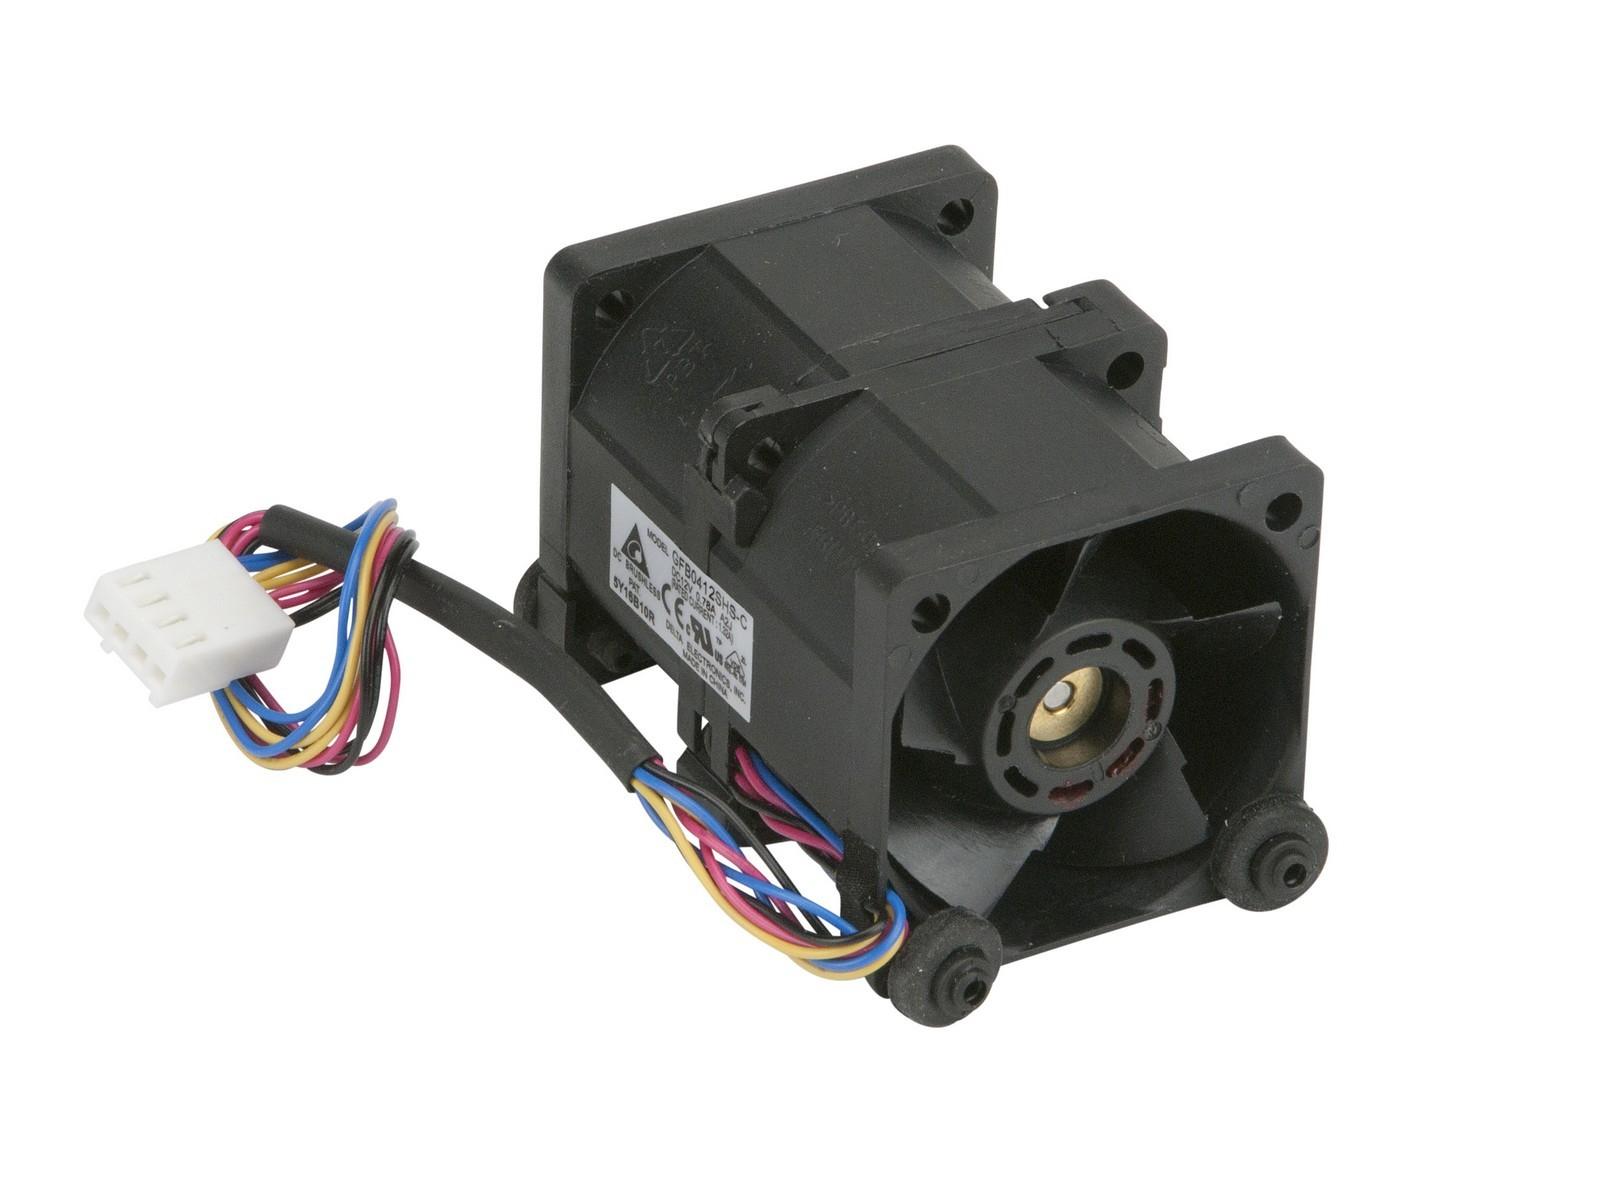 Supermicro FAN-0157L4 hardware cooling accessory Black